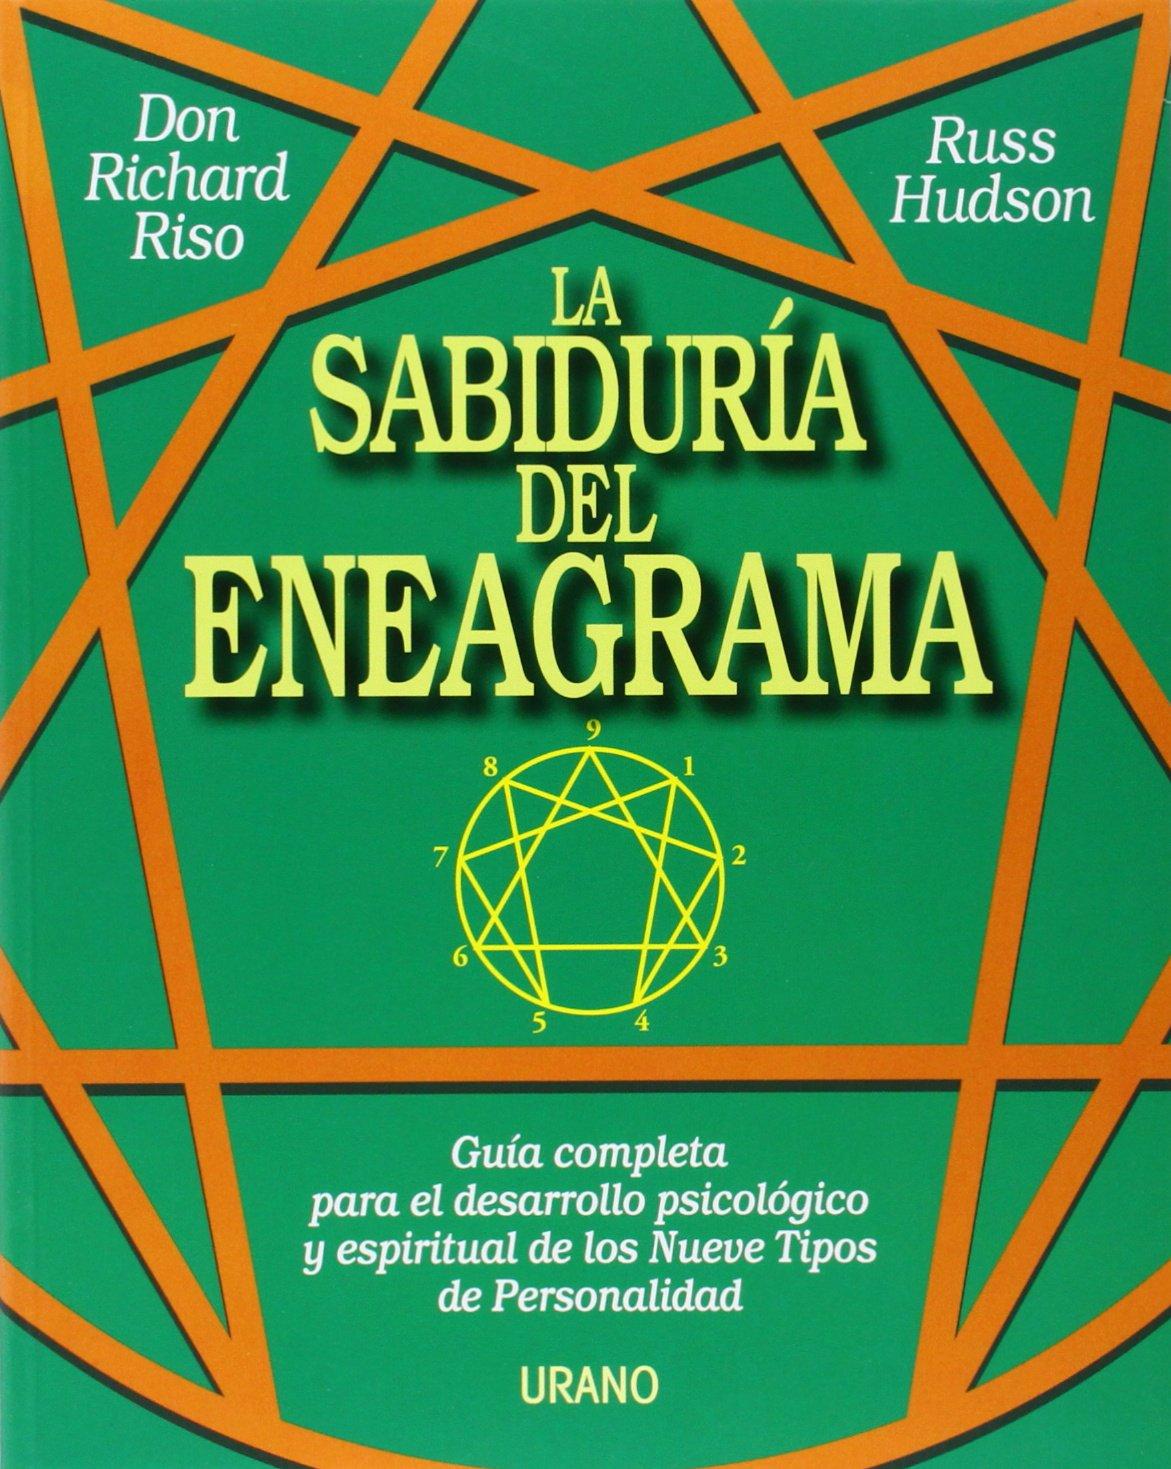 La Sabiduria Del Eneagrama   Don Richard Riso & Russ Hudson